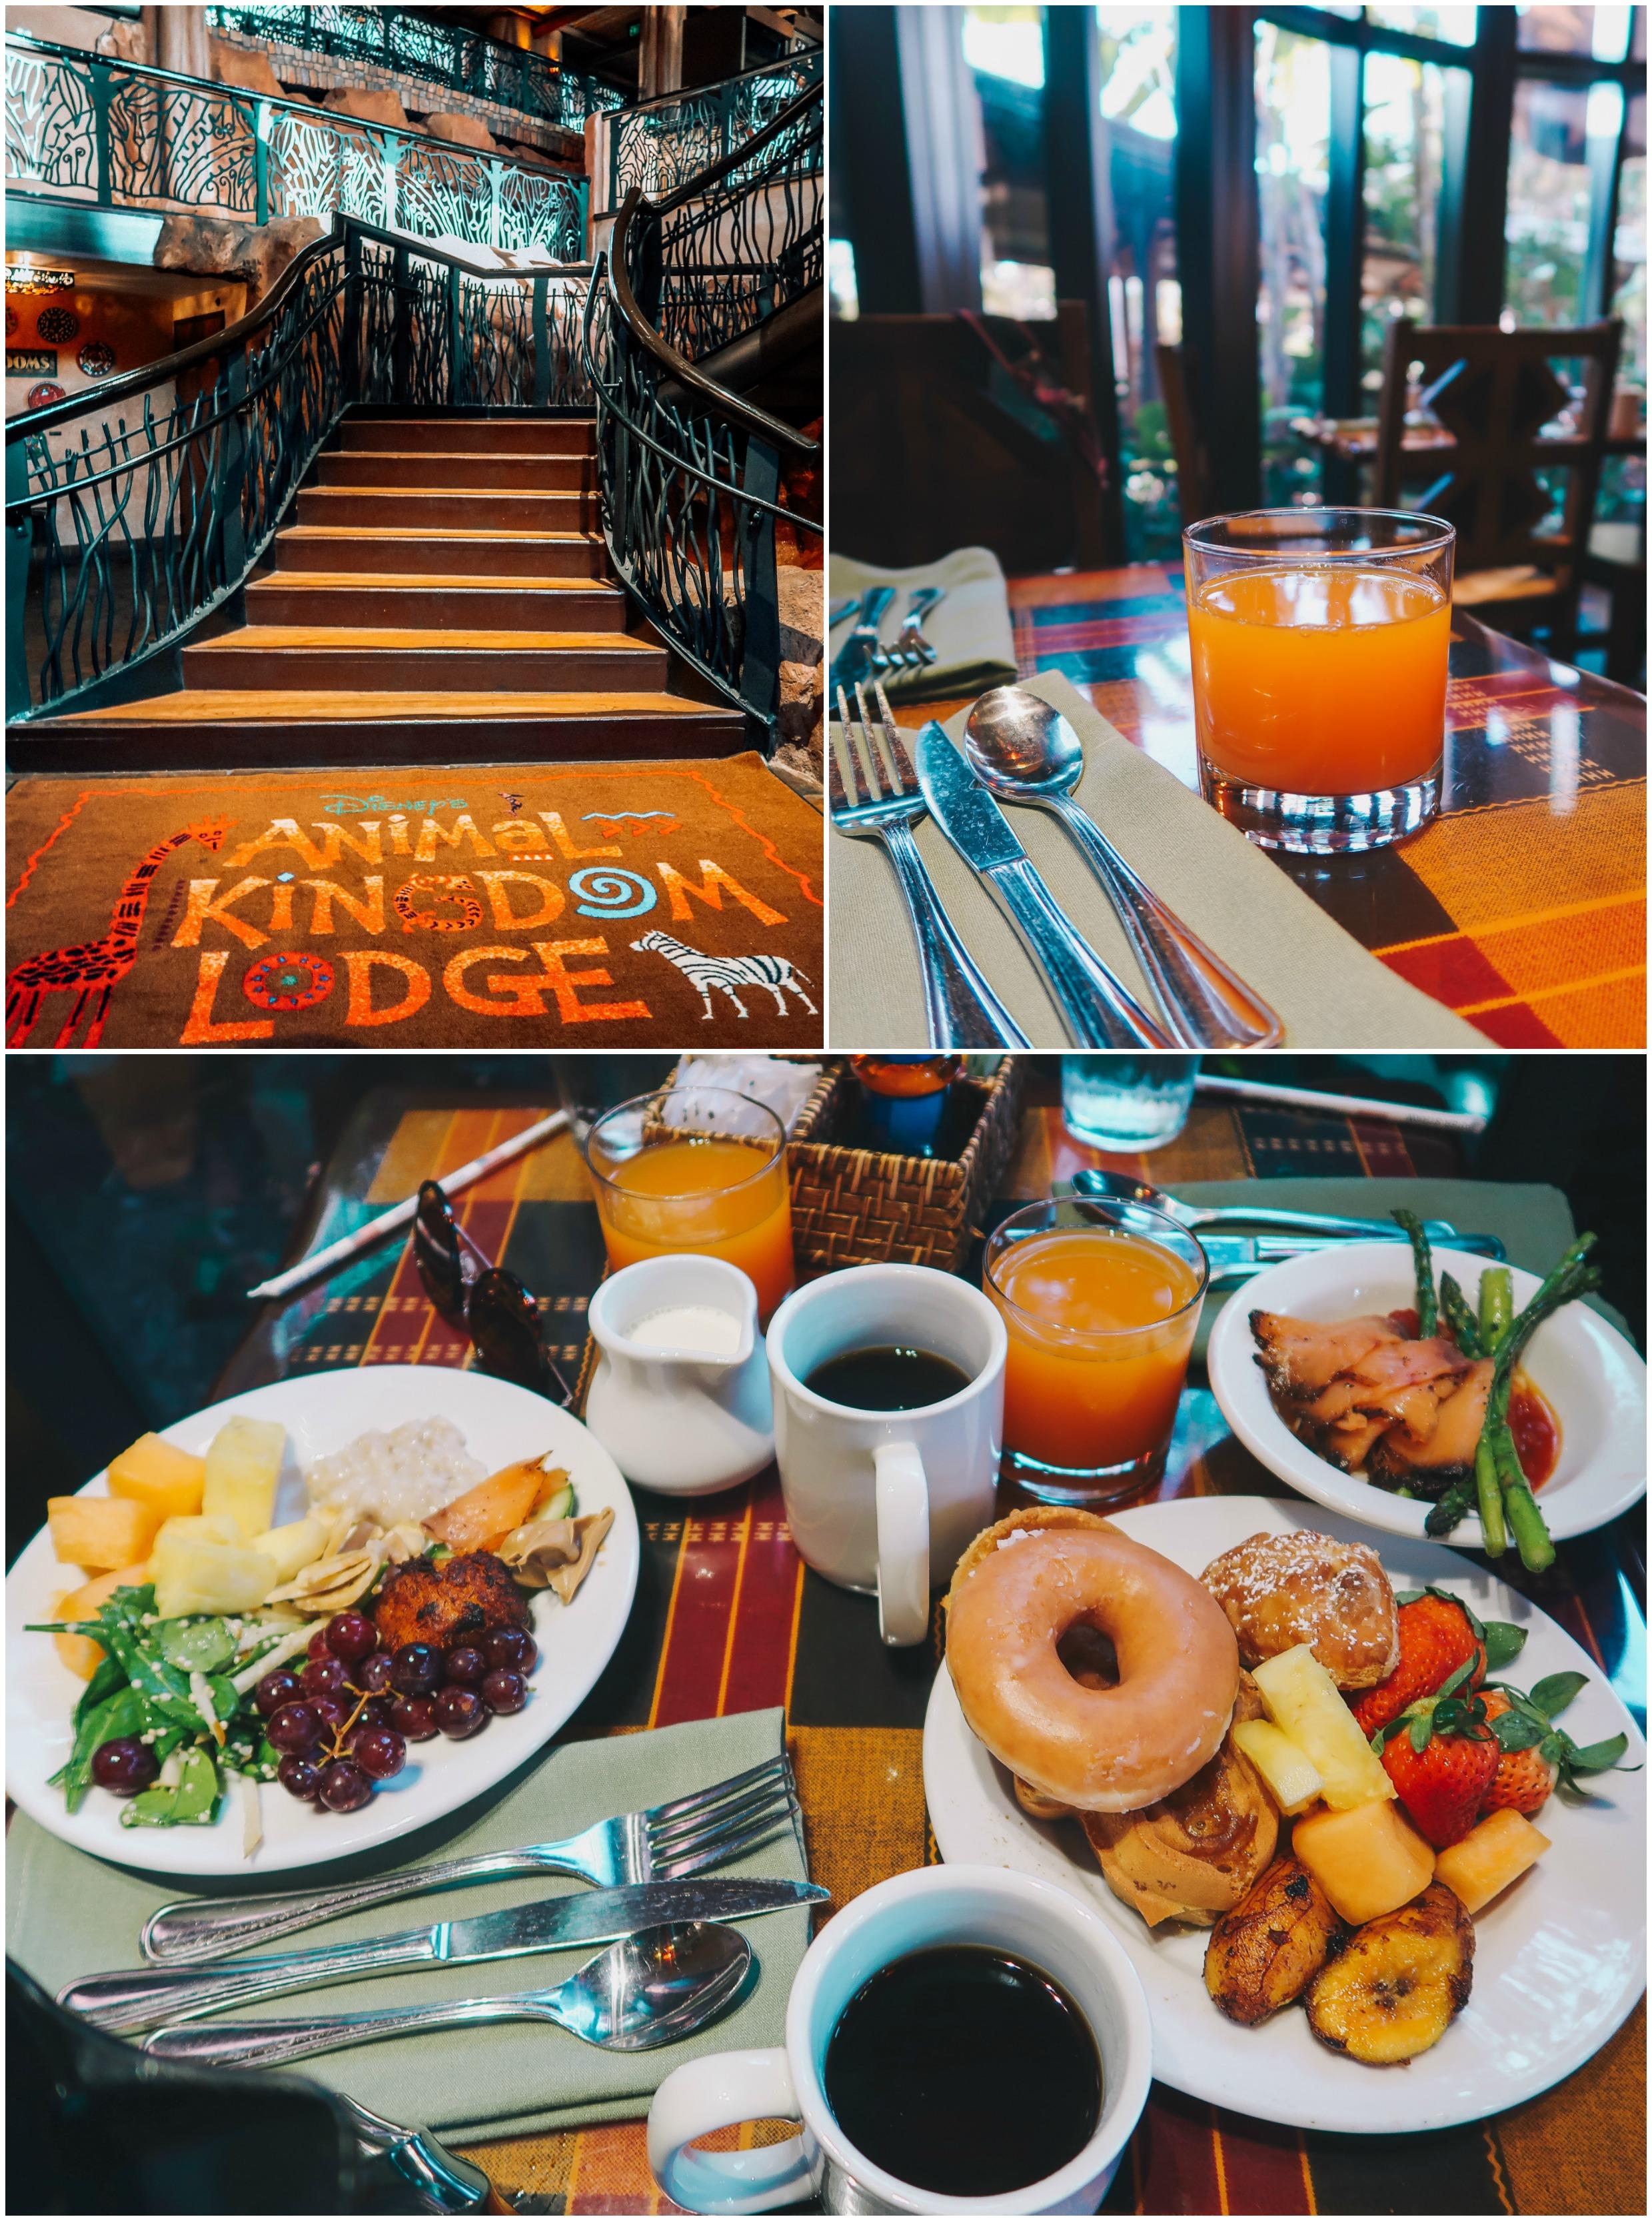 breakfast at boma animal kingdom resort walt disney world travel plans